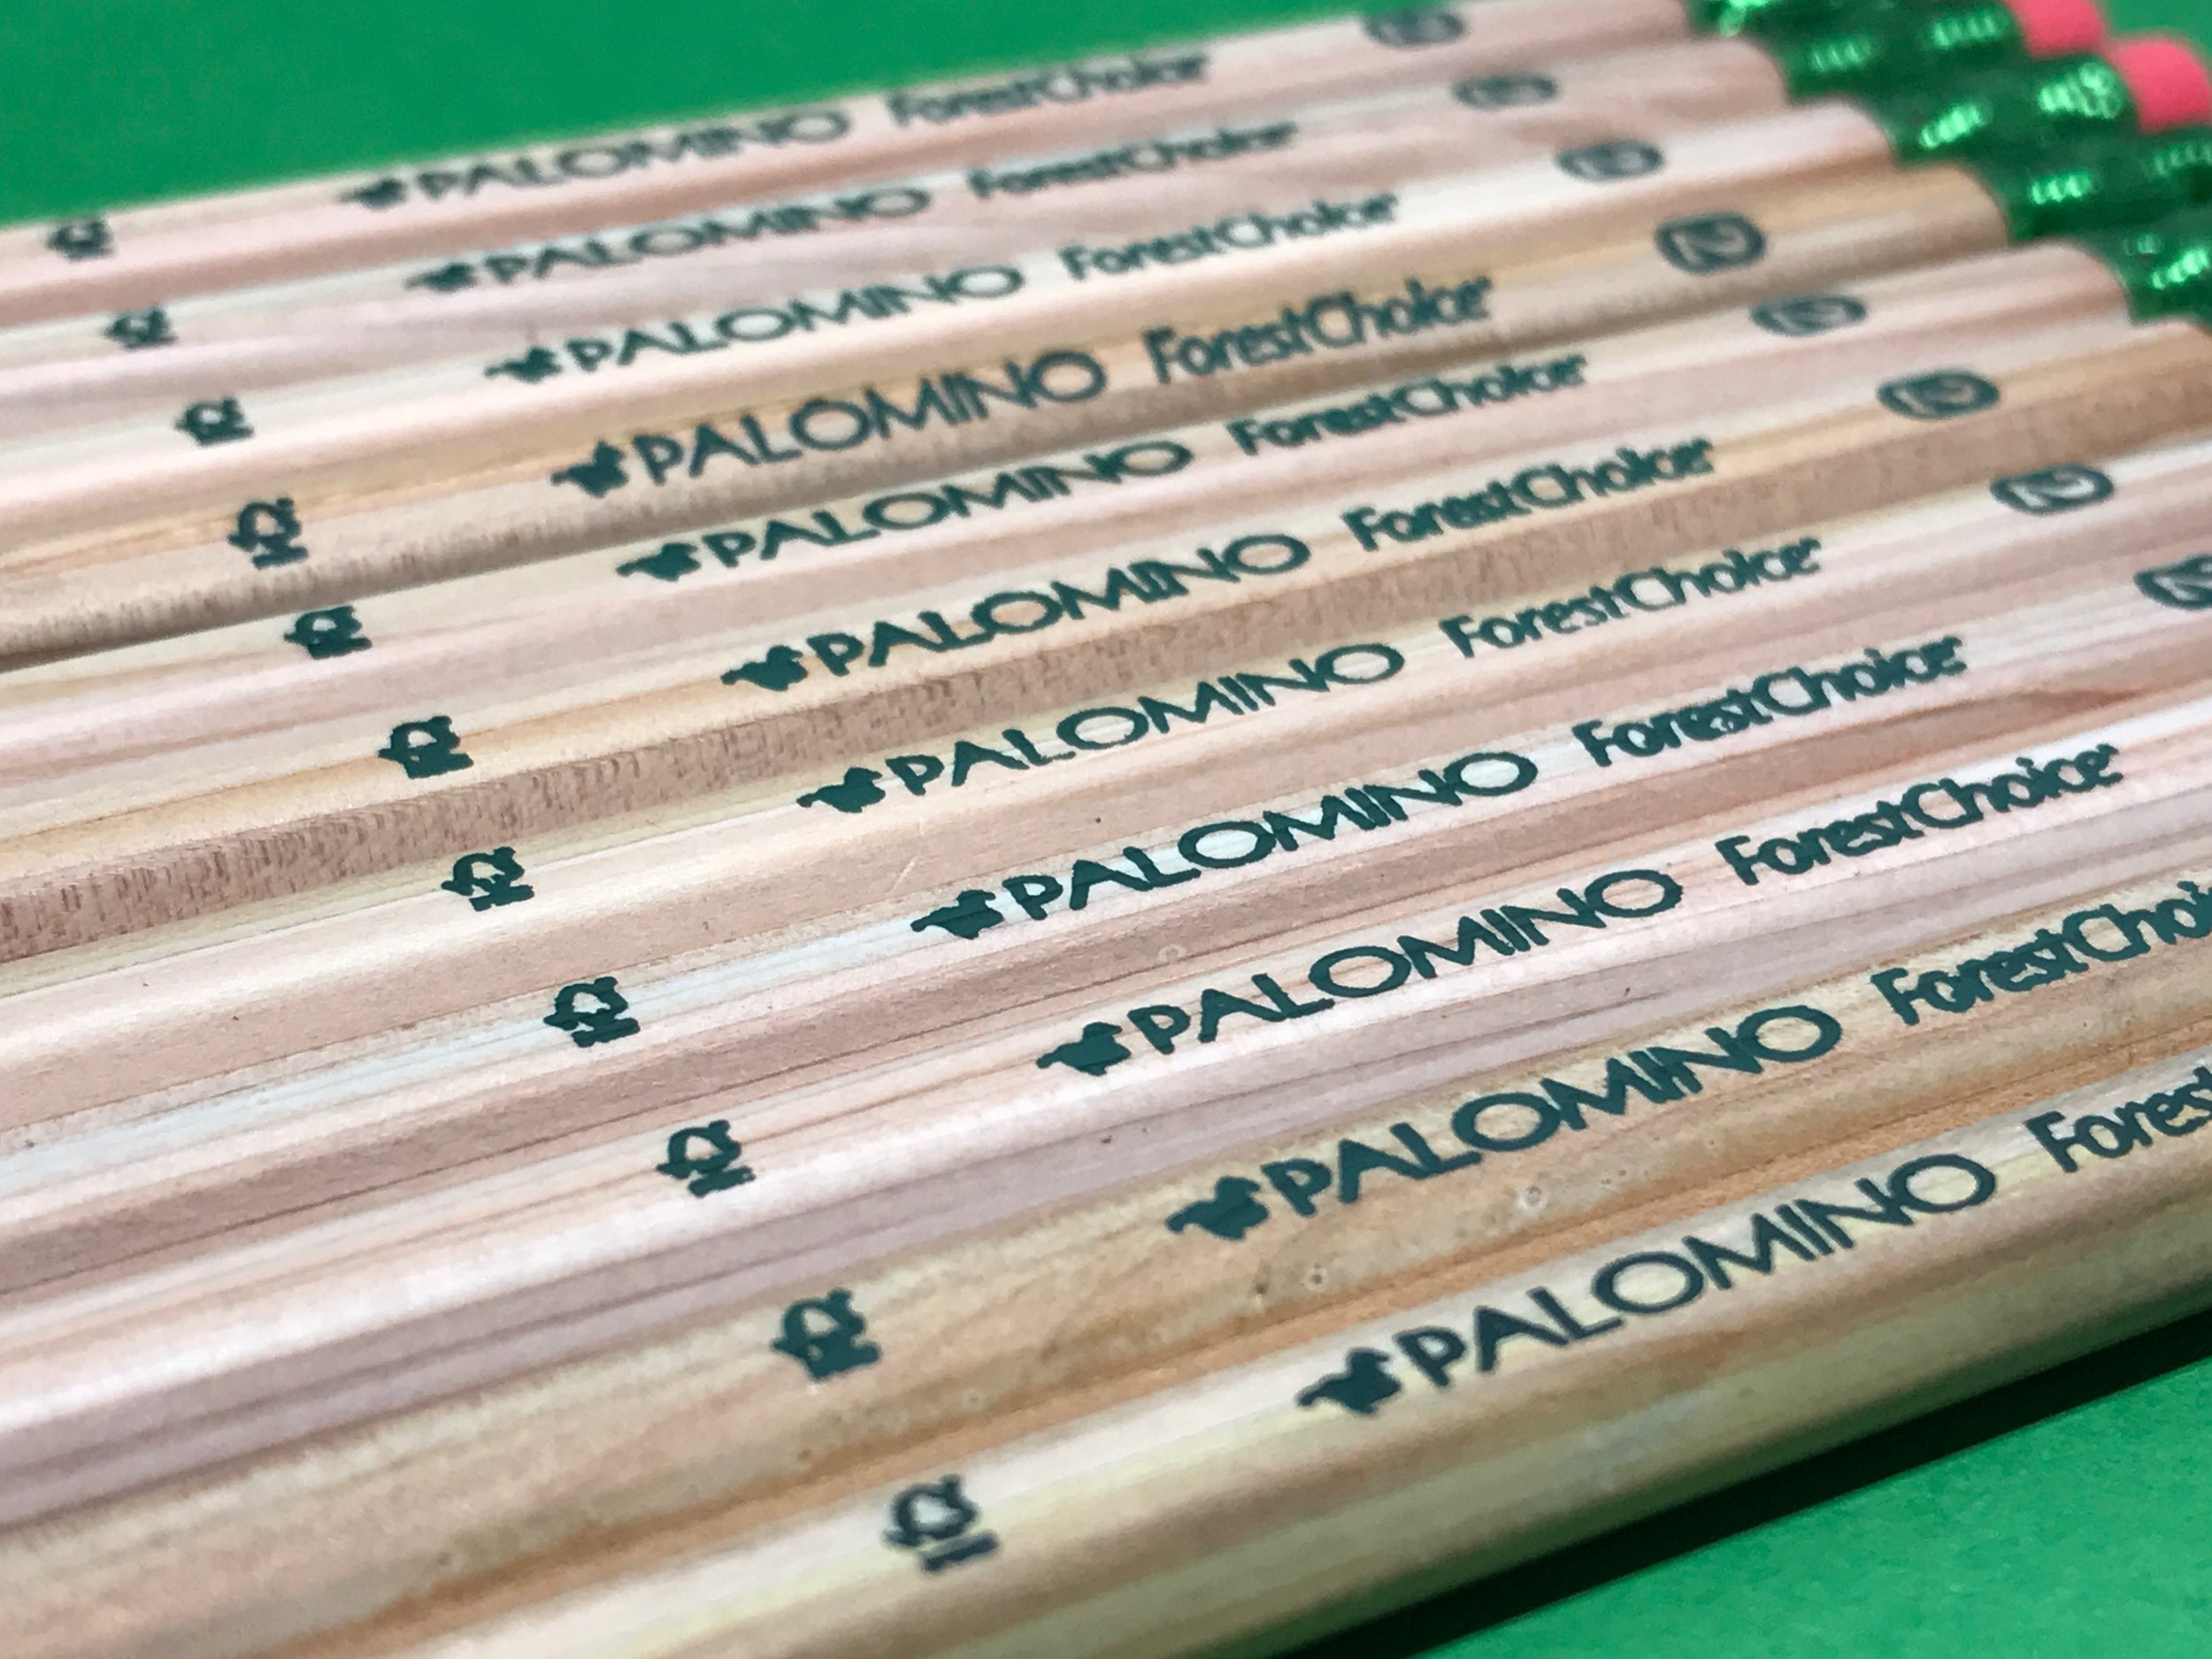 palomino-forest-choice-pencil-3.jpg